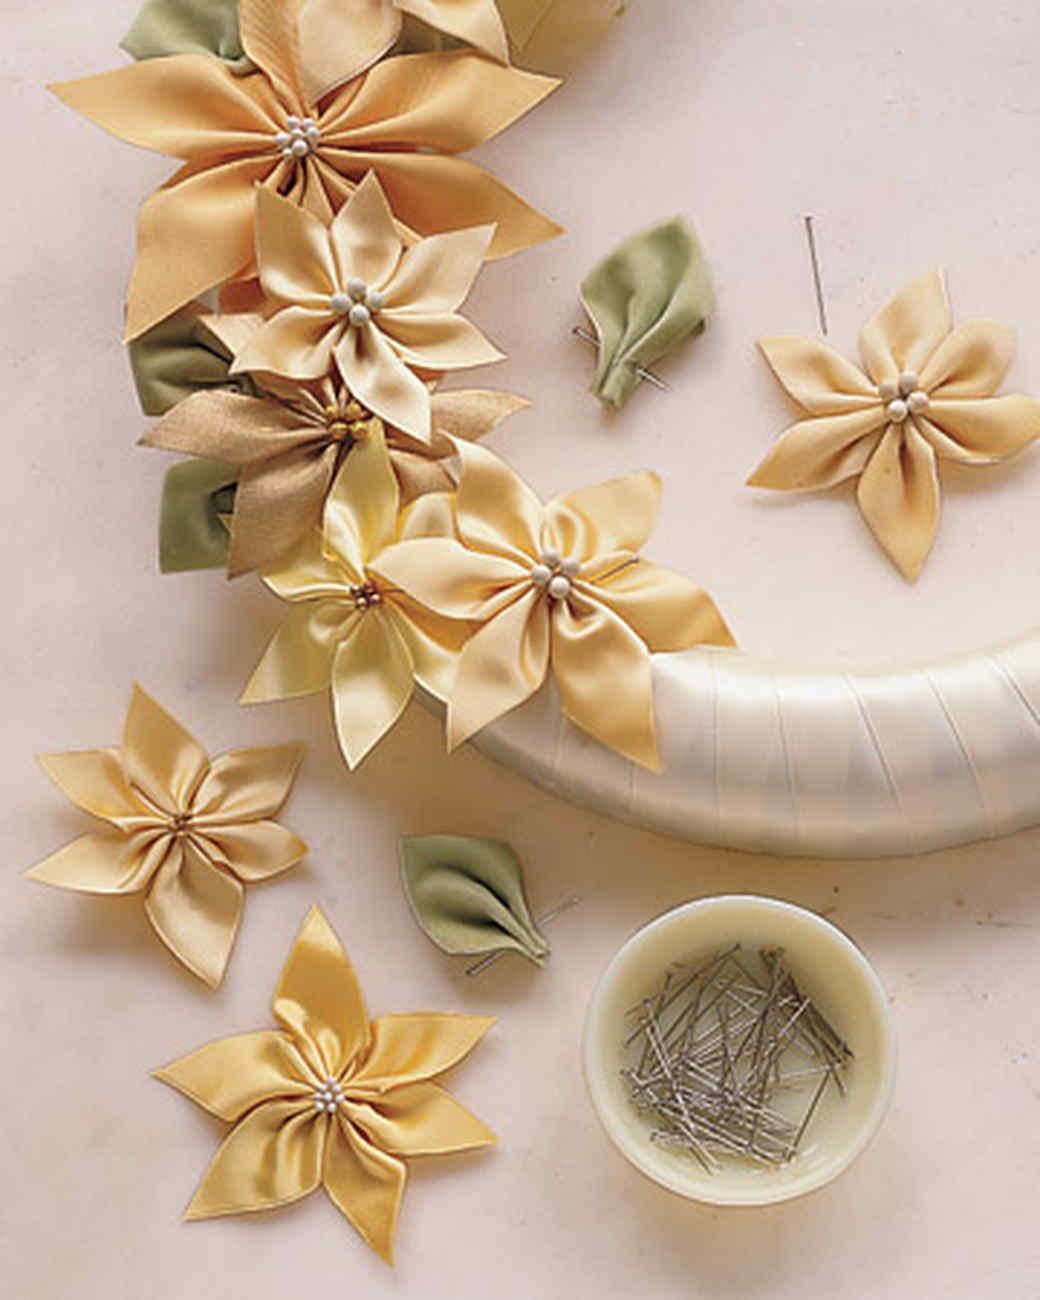 26 Gauge Wire >> Ribbon-Poinsettia Wreath | Martha Stewart